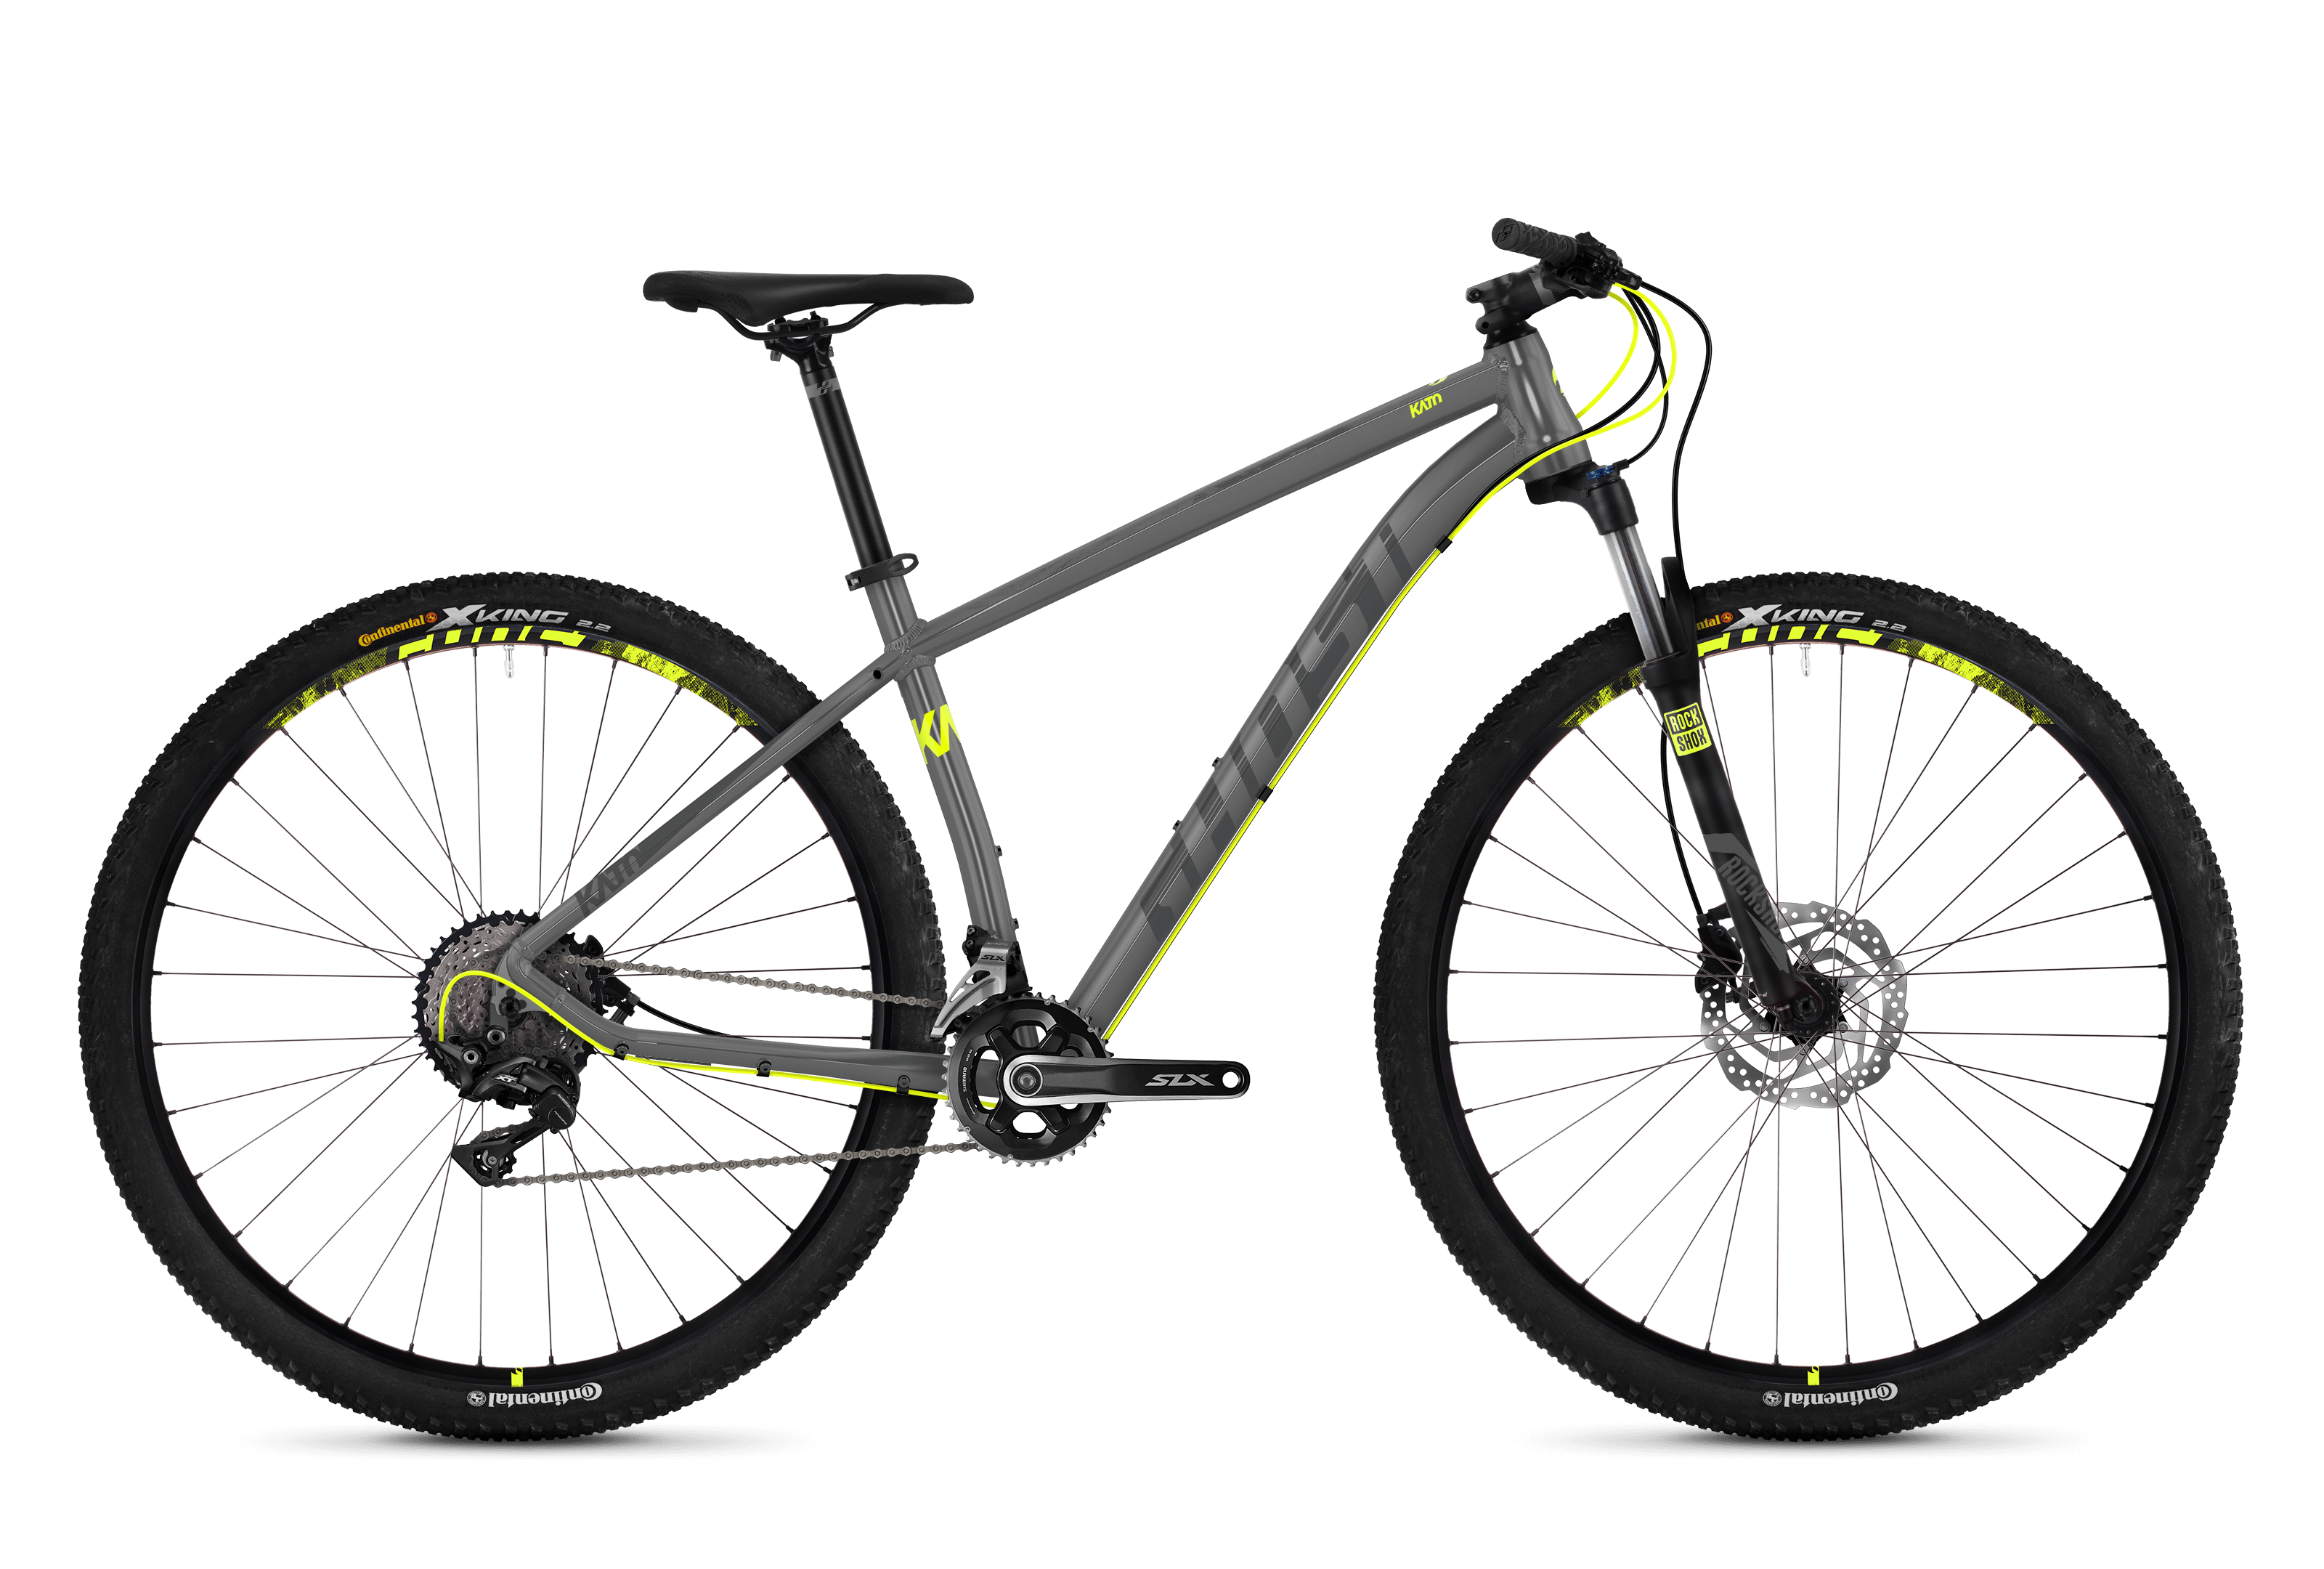 Horské kolo GHOST Kato 7.9 grey / yellow XL 2018